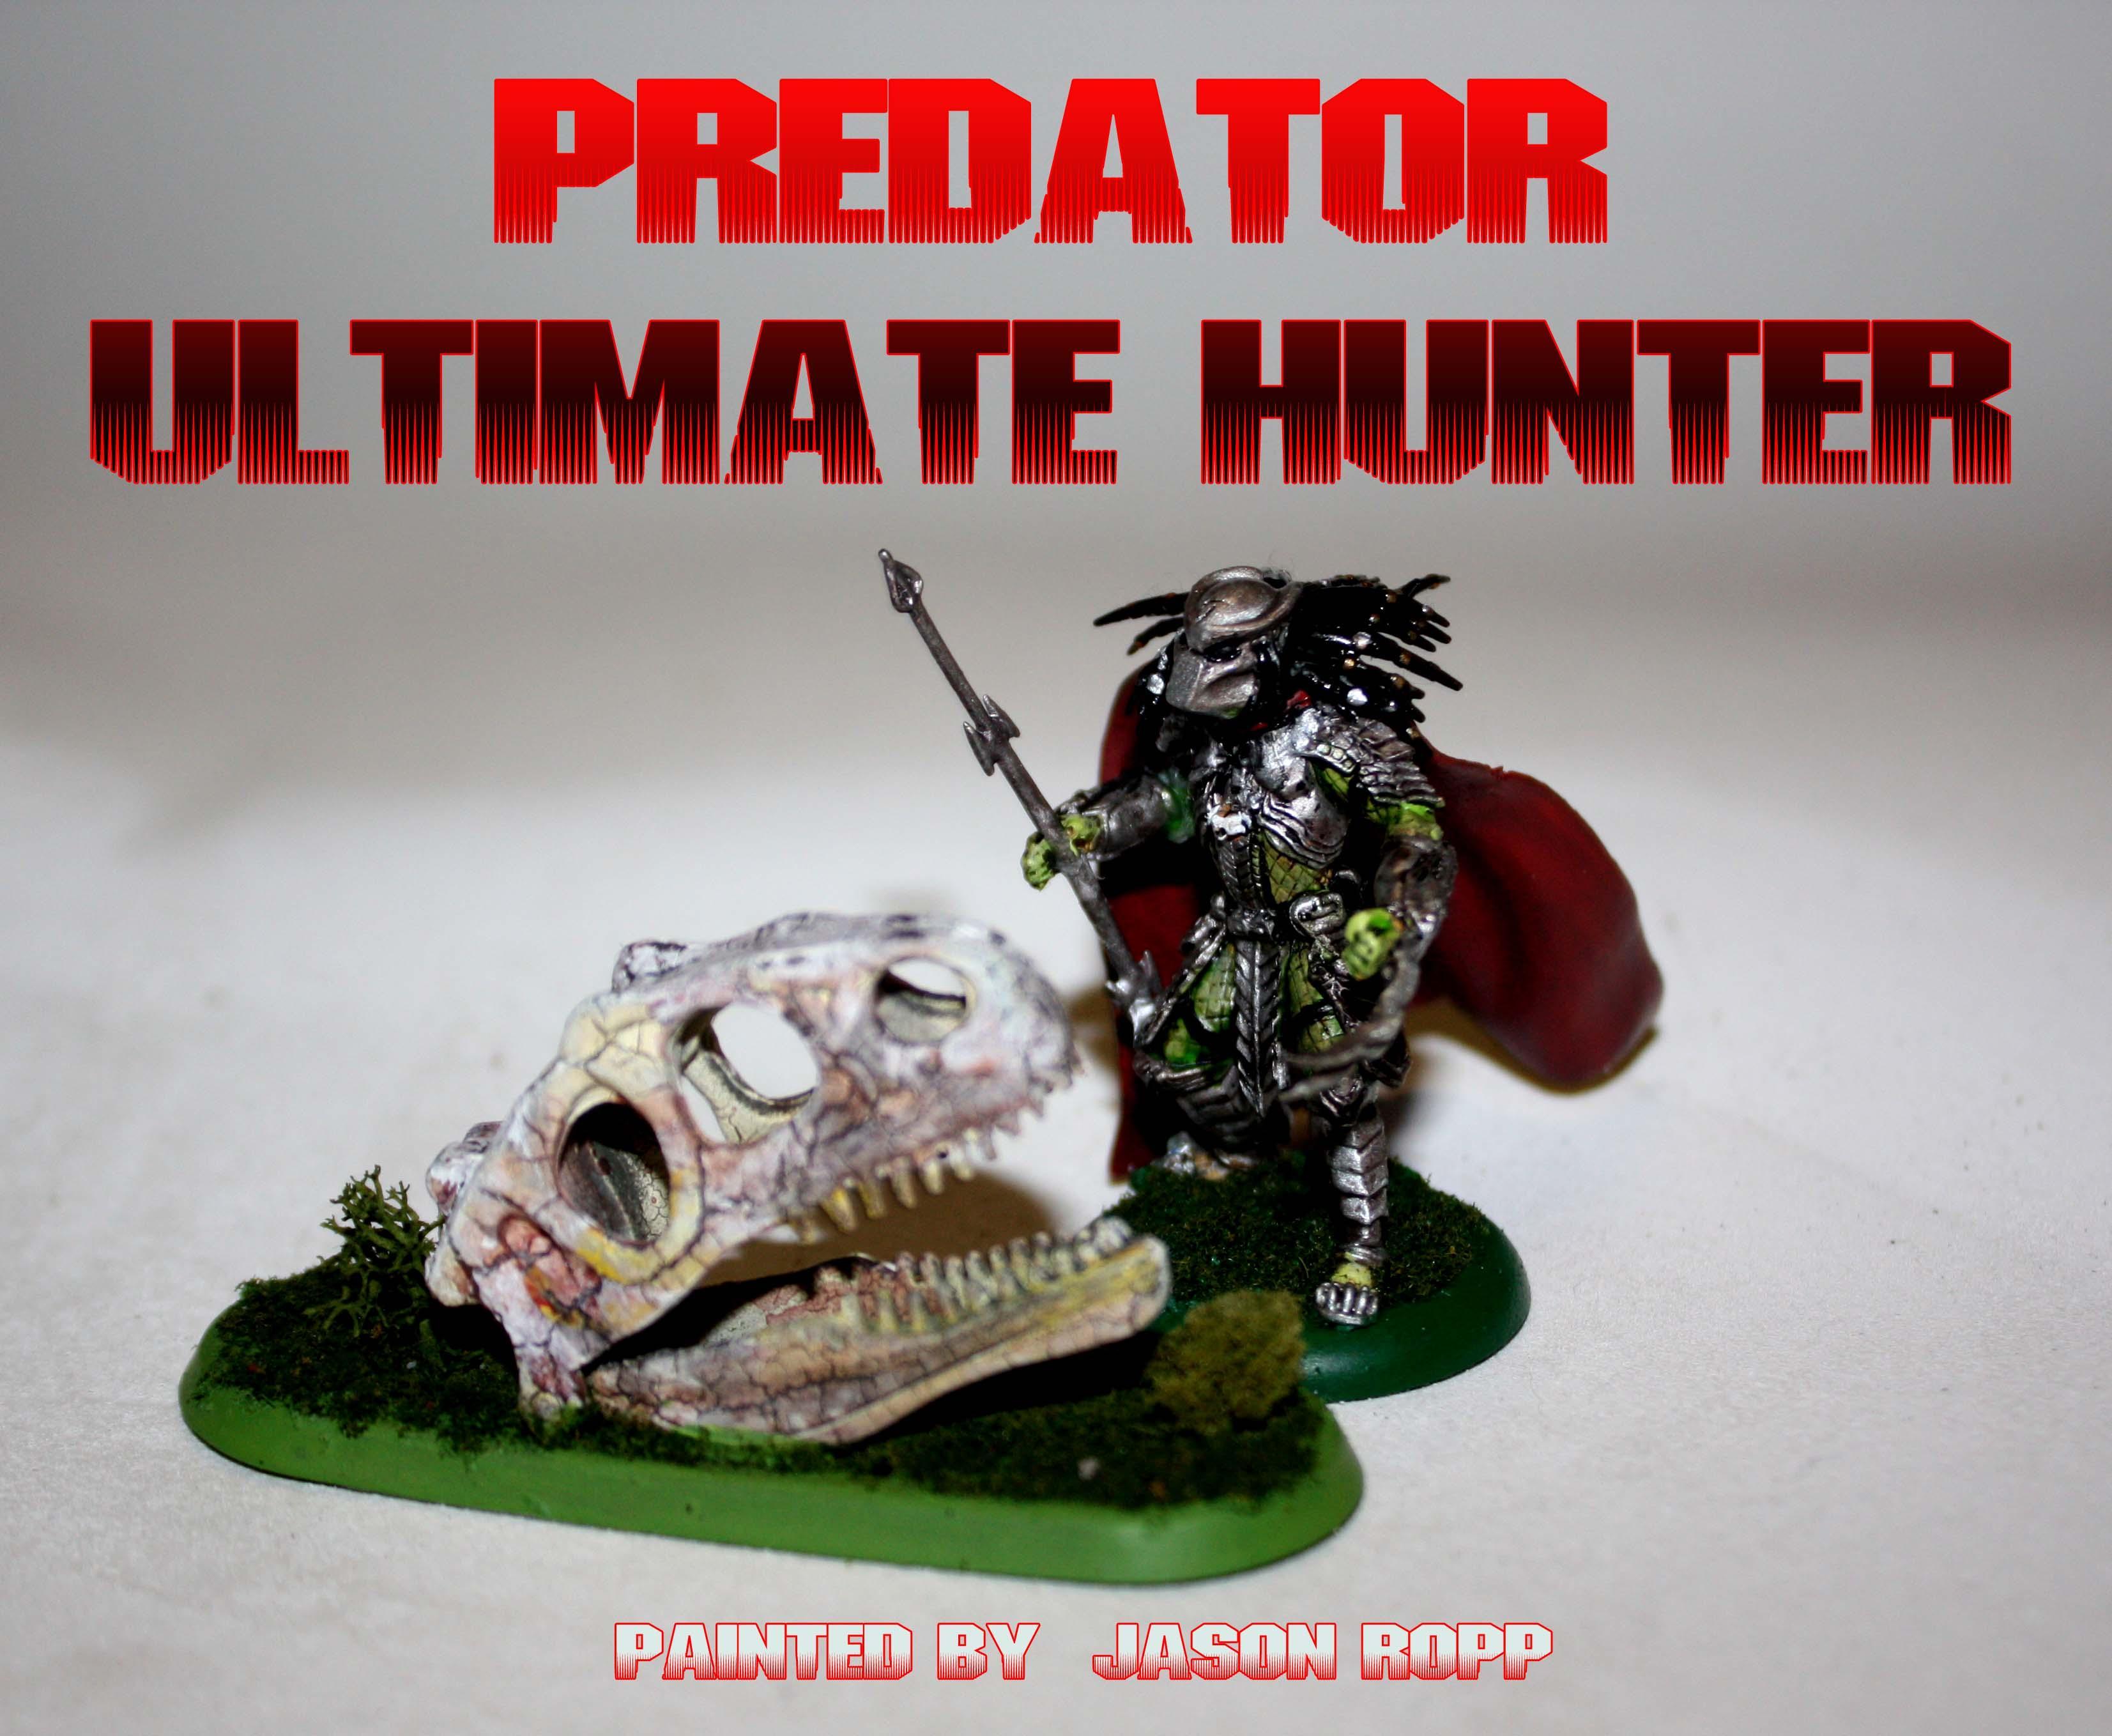 28mm, 32mm, Aliens, Avp, Avpvt, Battle, Dark Horse, Dinosaur, Game, Gynisis, Heroclix, Horrorclix, Miniatures, Predator, Skull, T-rex, Terminator Armor, Wargemer